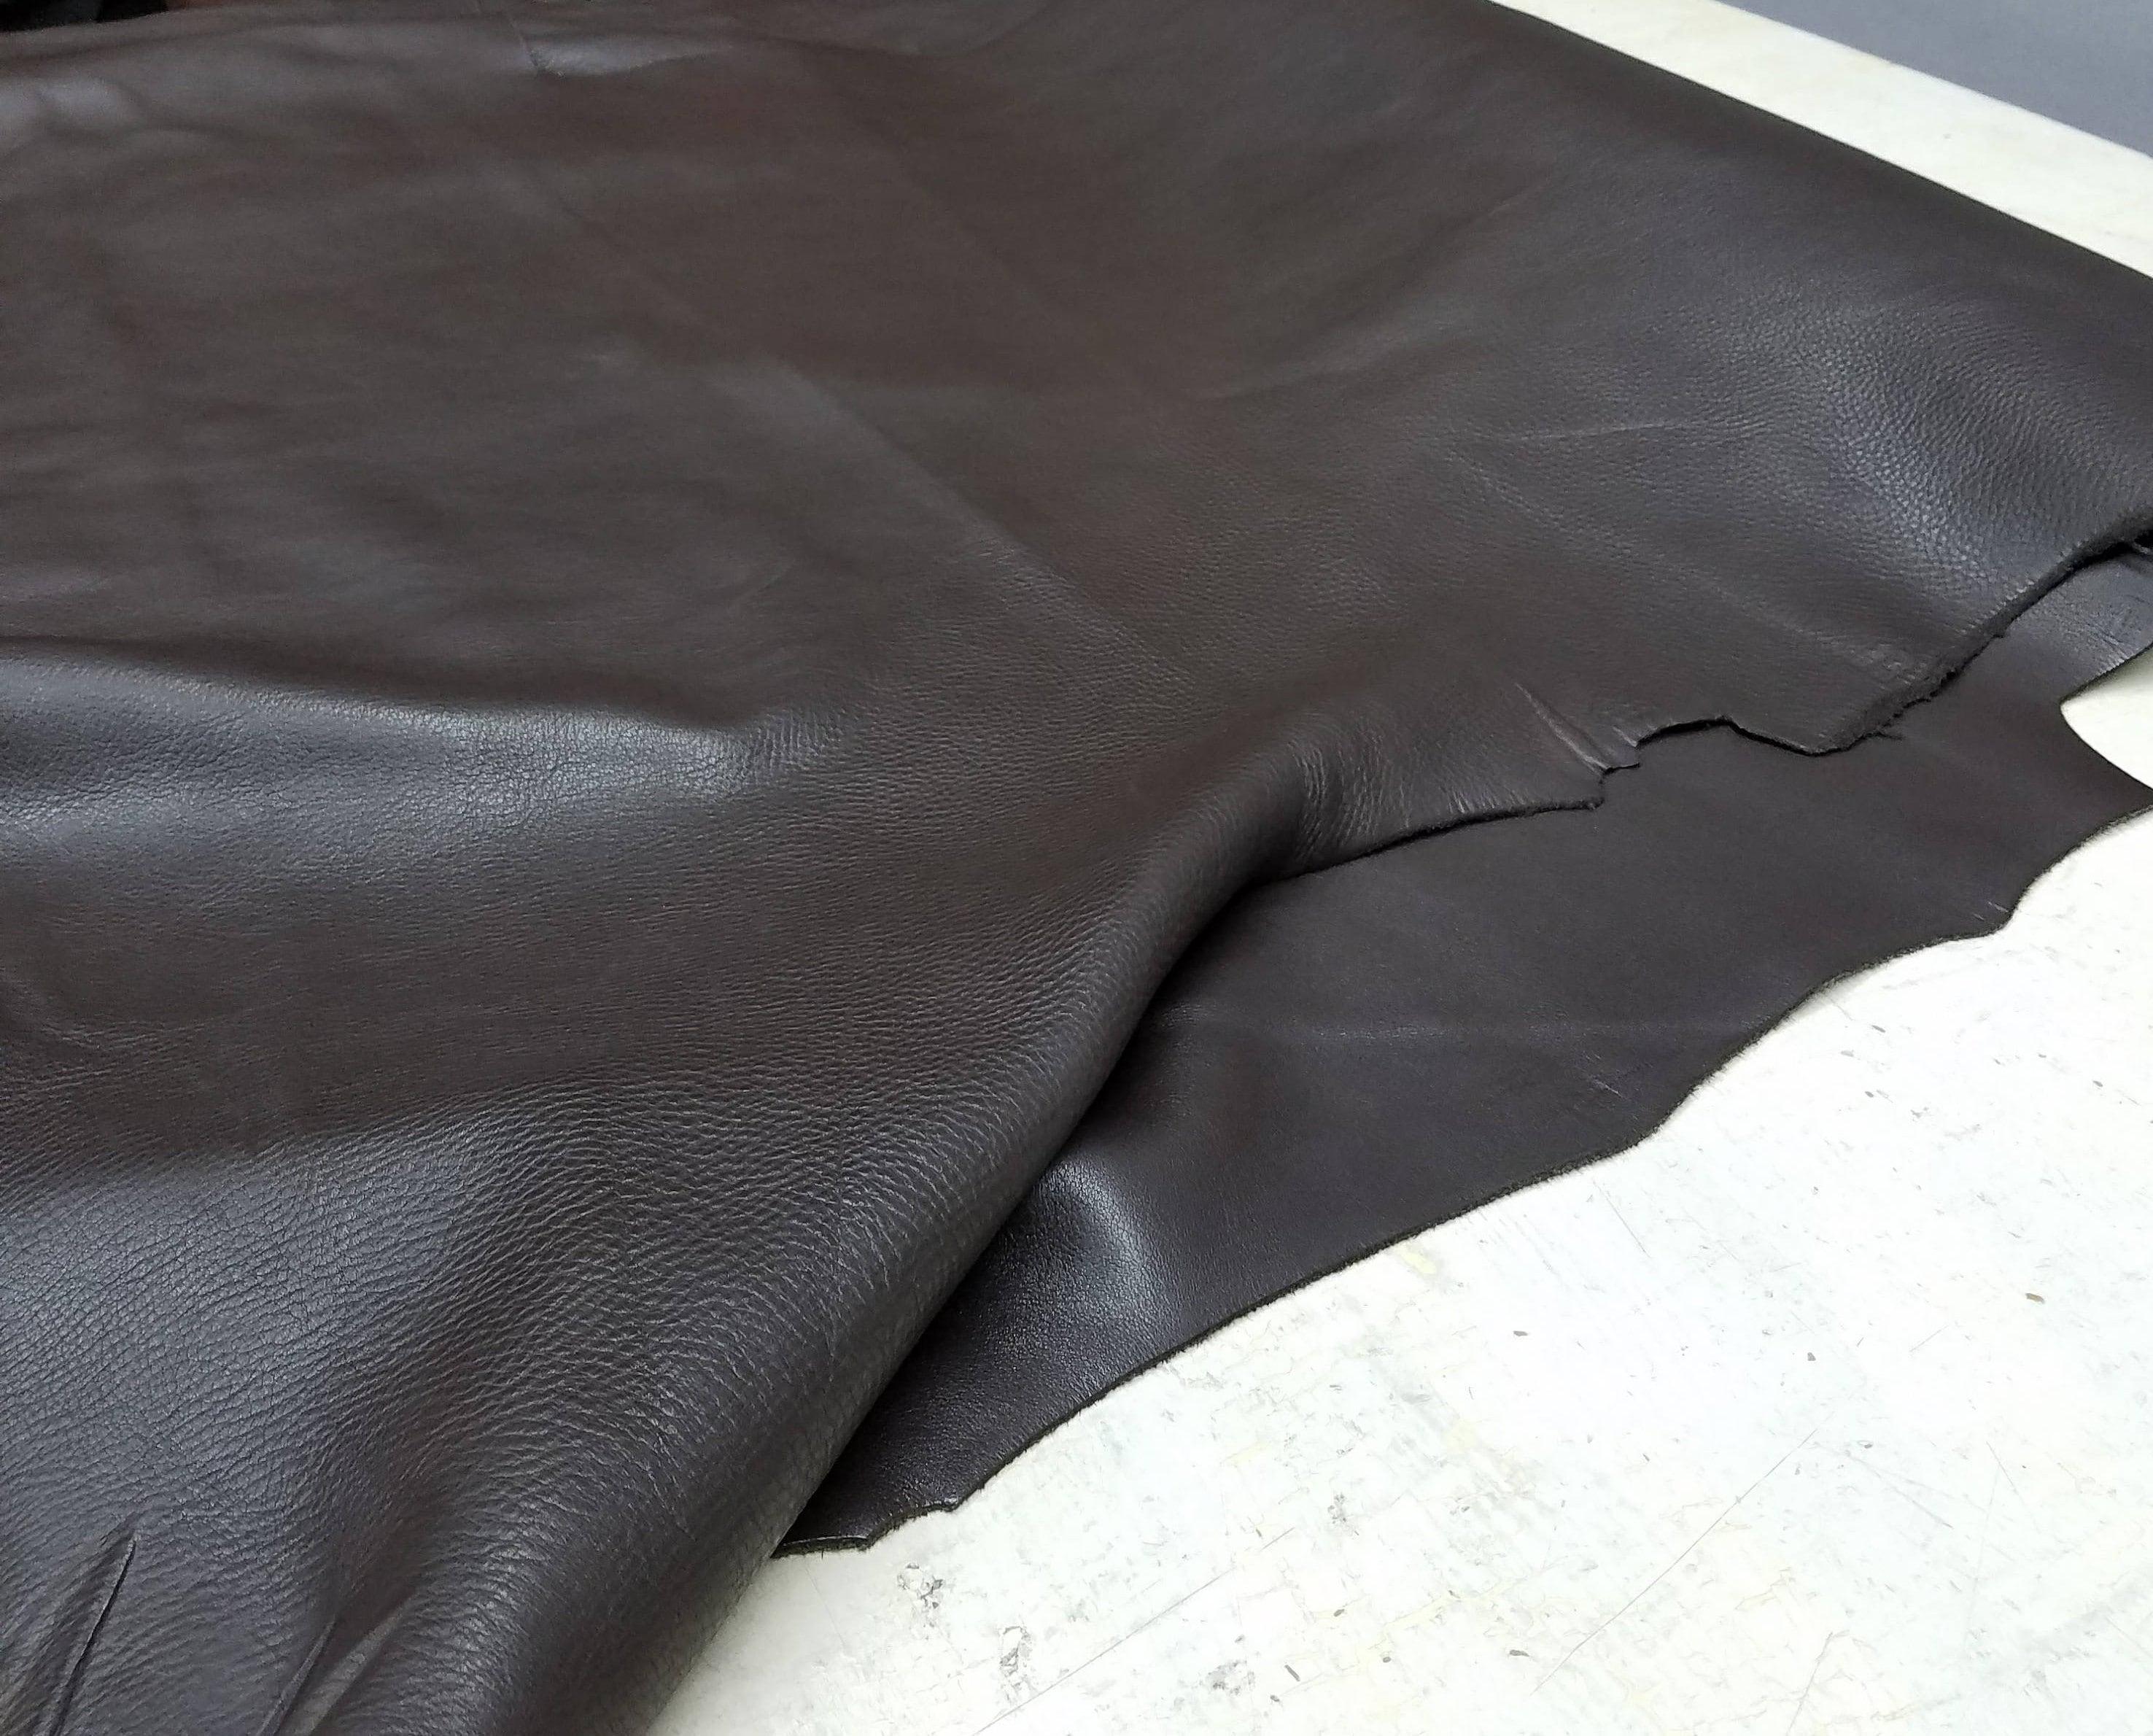 23-28 carrés carrés carrés Dark Brown Ultima tumblegrain aniline 3,5 à 4,0 oz tumblegrain vache peau cuir de vache sac à main sellerie cuir NAT cuirs 7f7df0